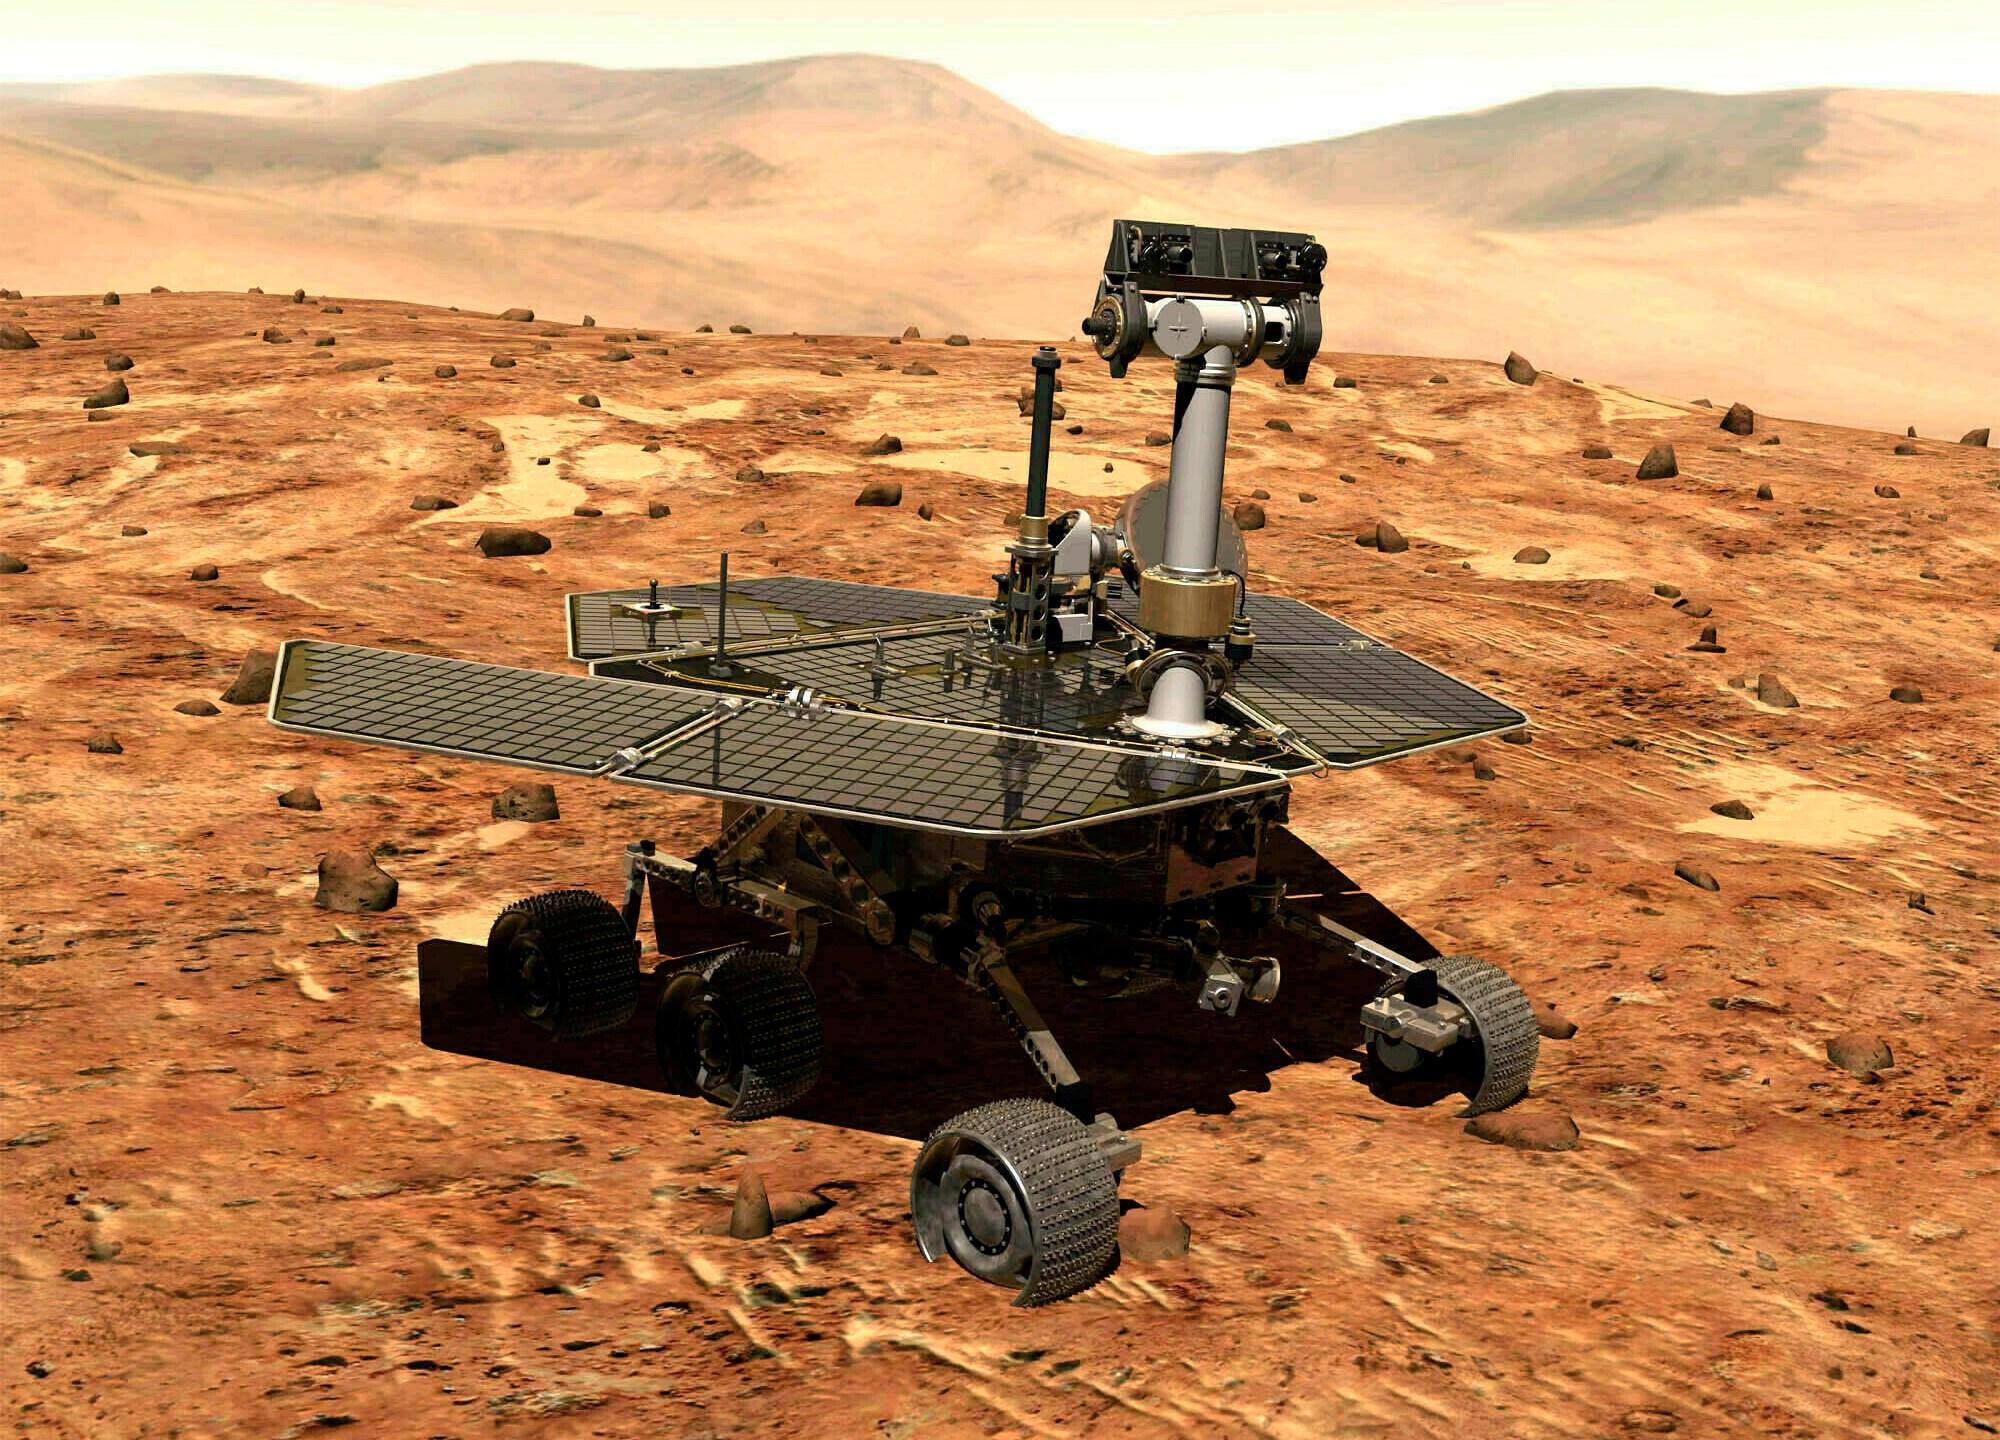 Space_Mars_Rover_48529-159532.jpg38440854